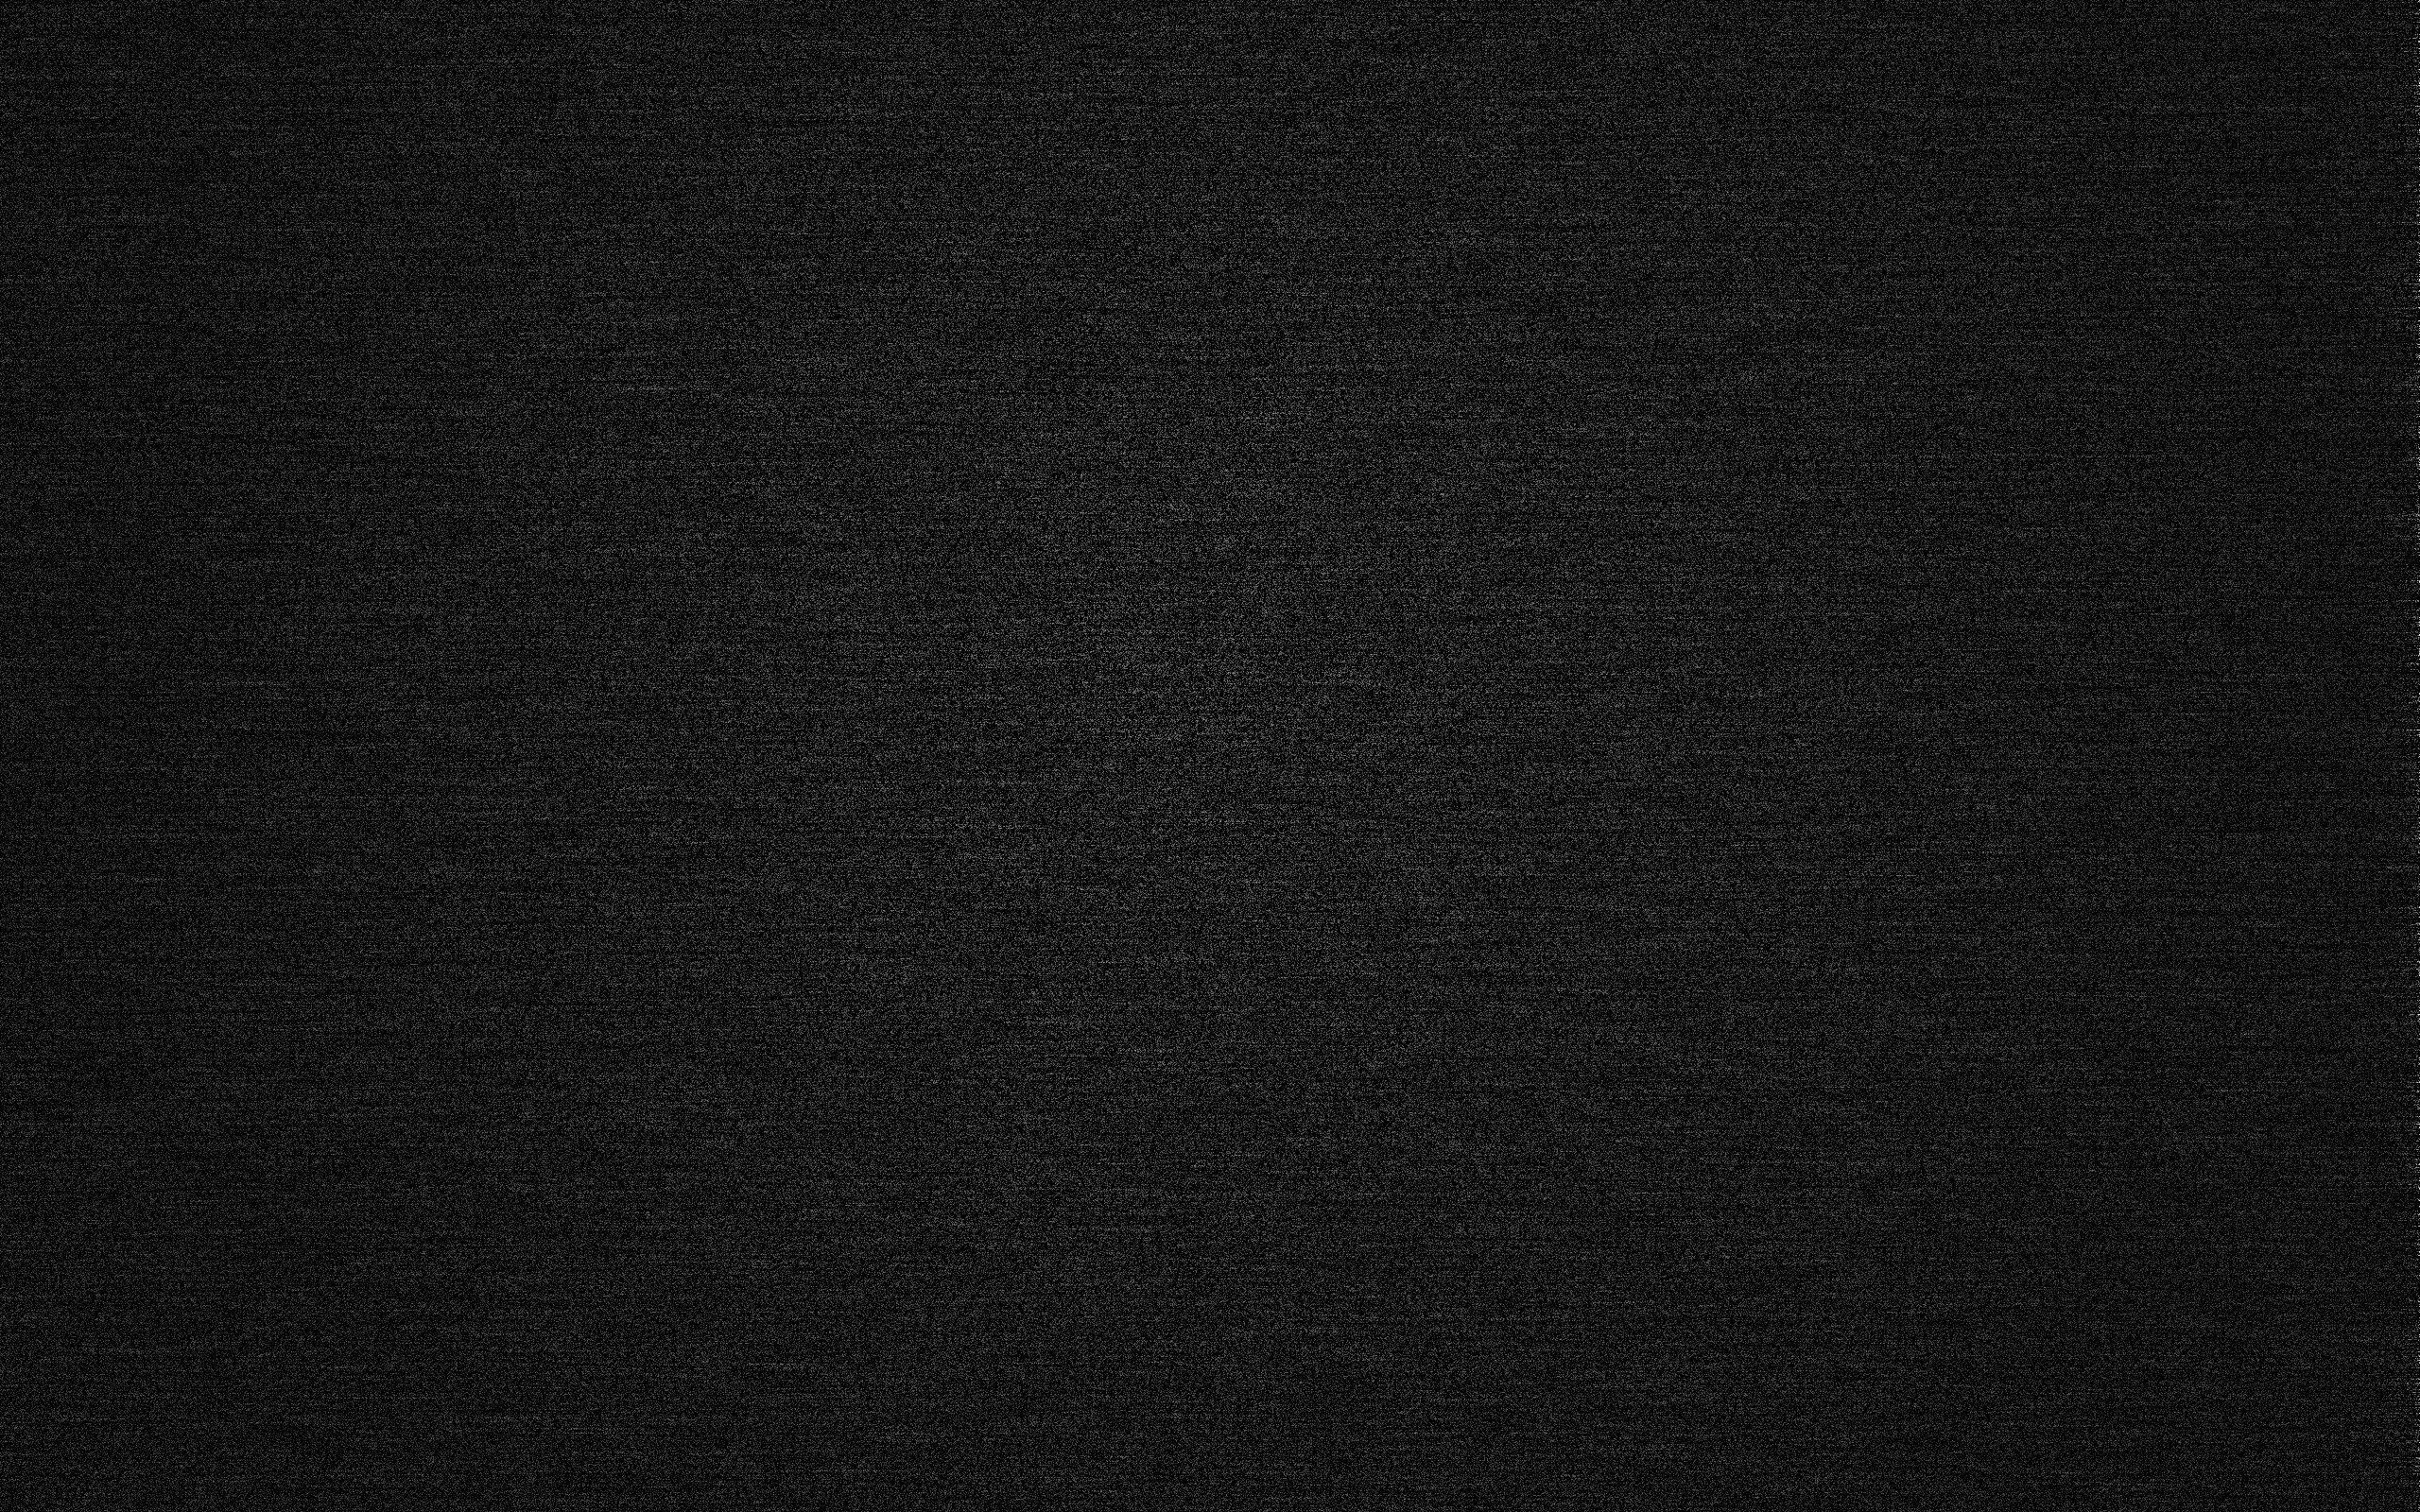 full black wallpaper - HD2560×1600